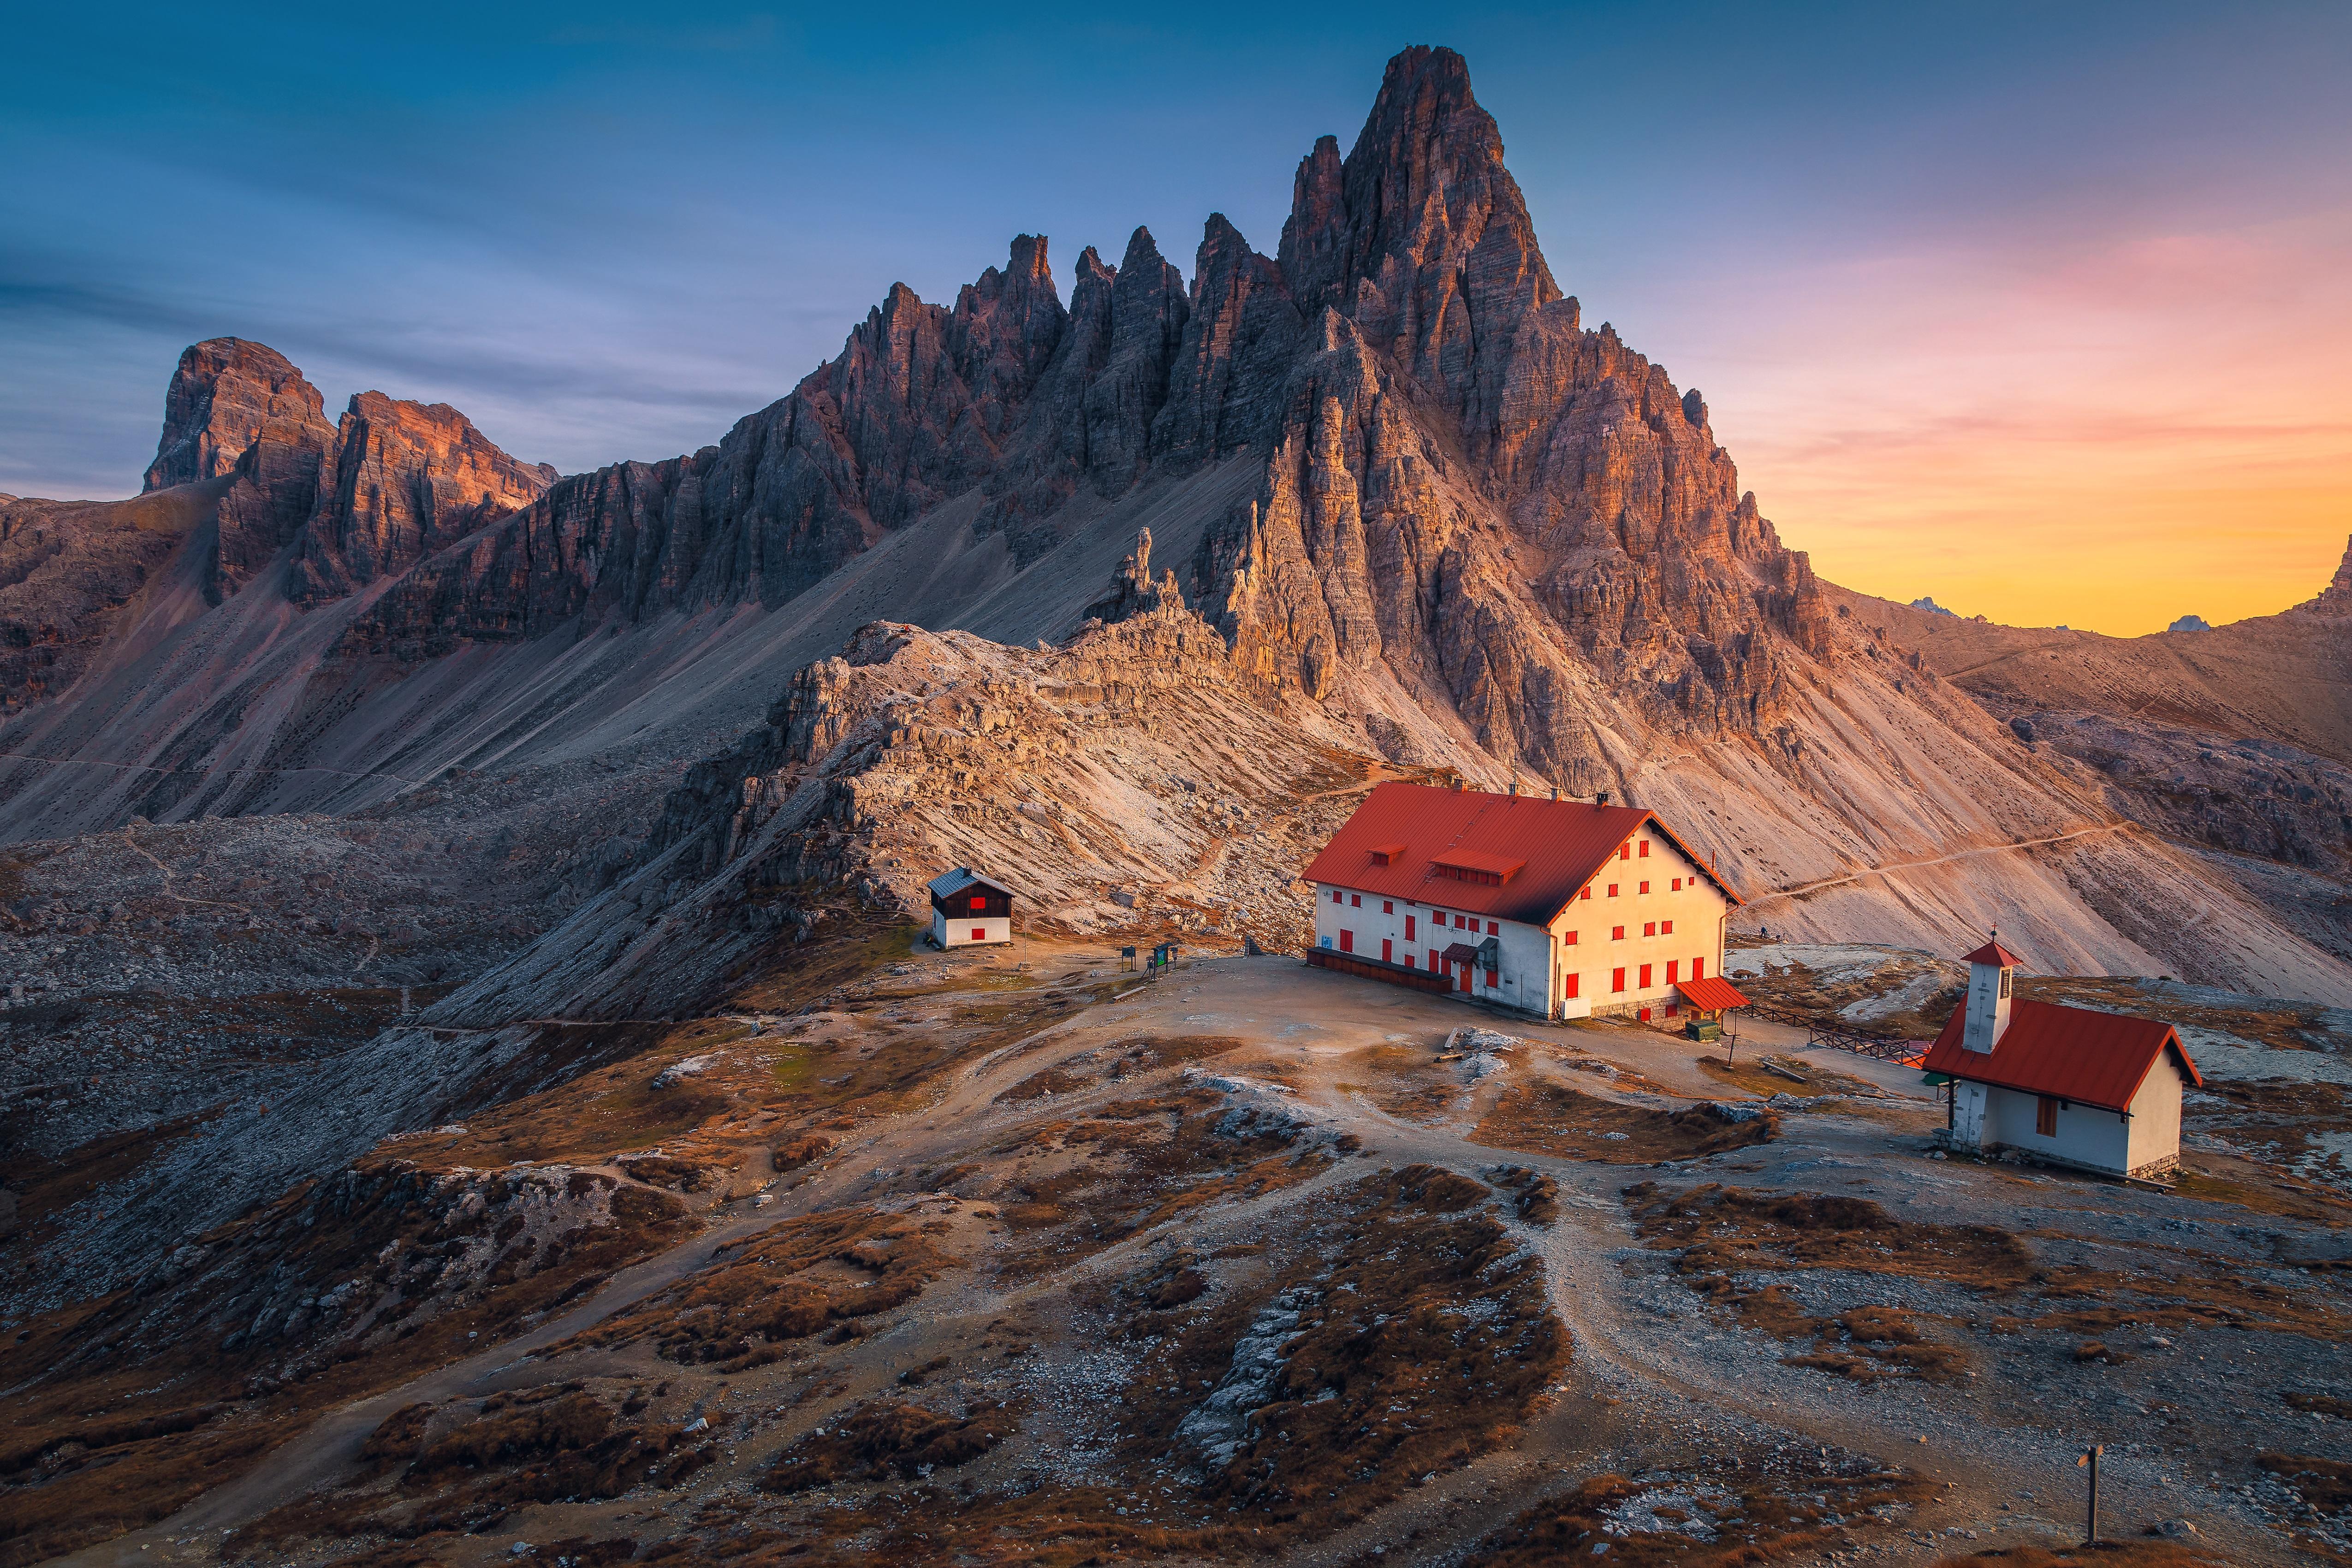 General 5100x3400 landscape mountains nature stone sky house Alps summit path hills peak sunlight sunset hut Italy lights dolomite alps